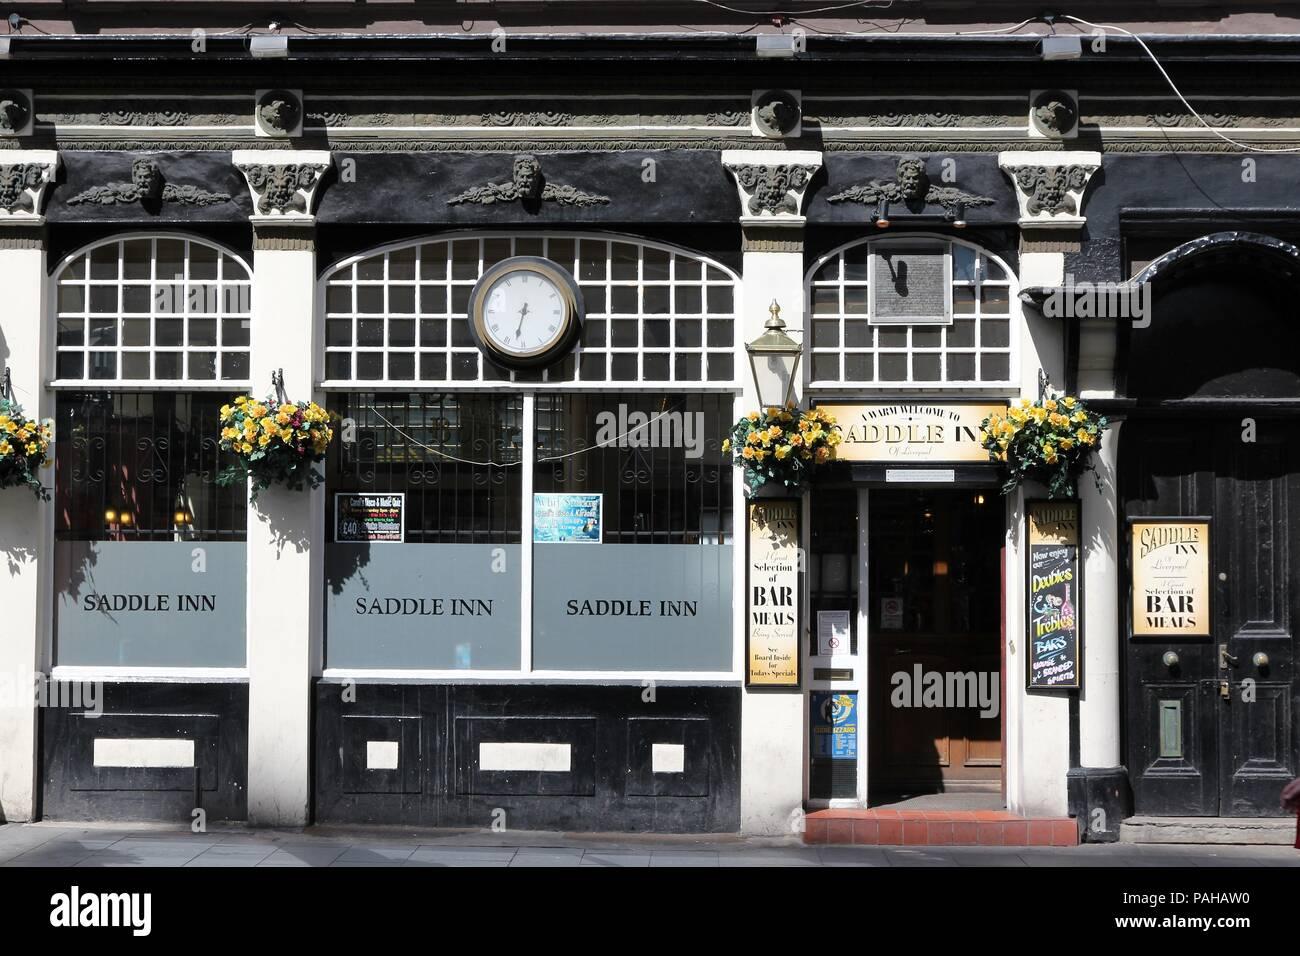 02622ac84ef LIVERPOOL, UK - APRIL 20: Saddle Inn pub on April 20, 2013 in